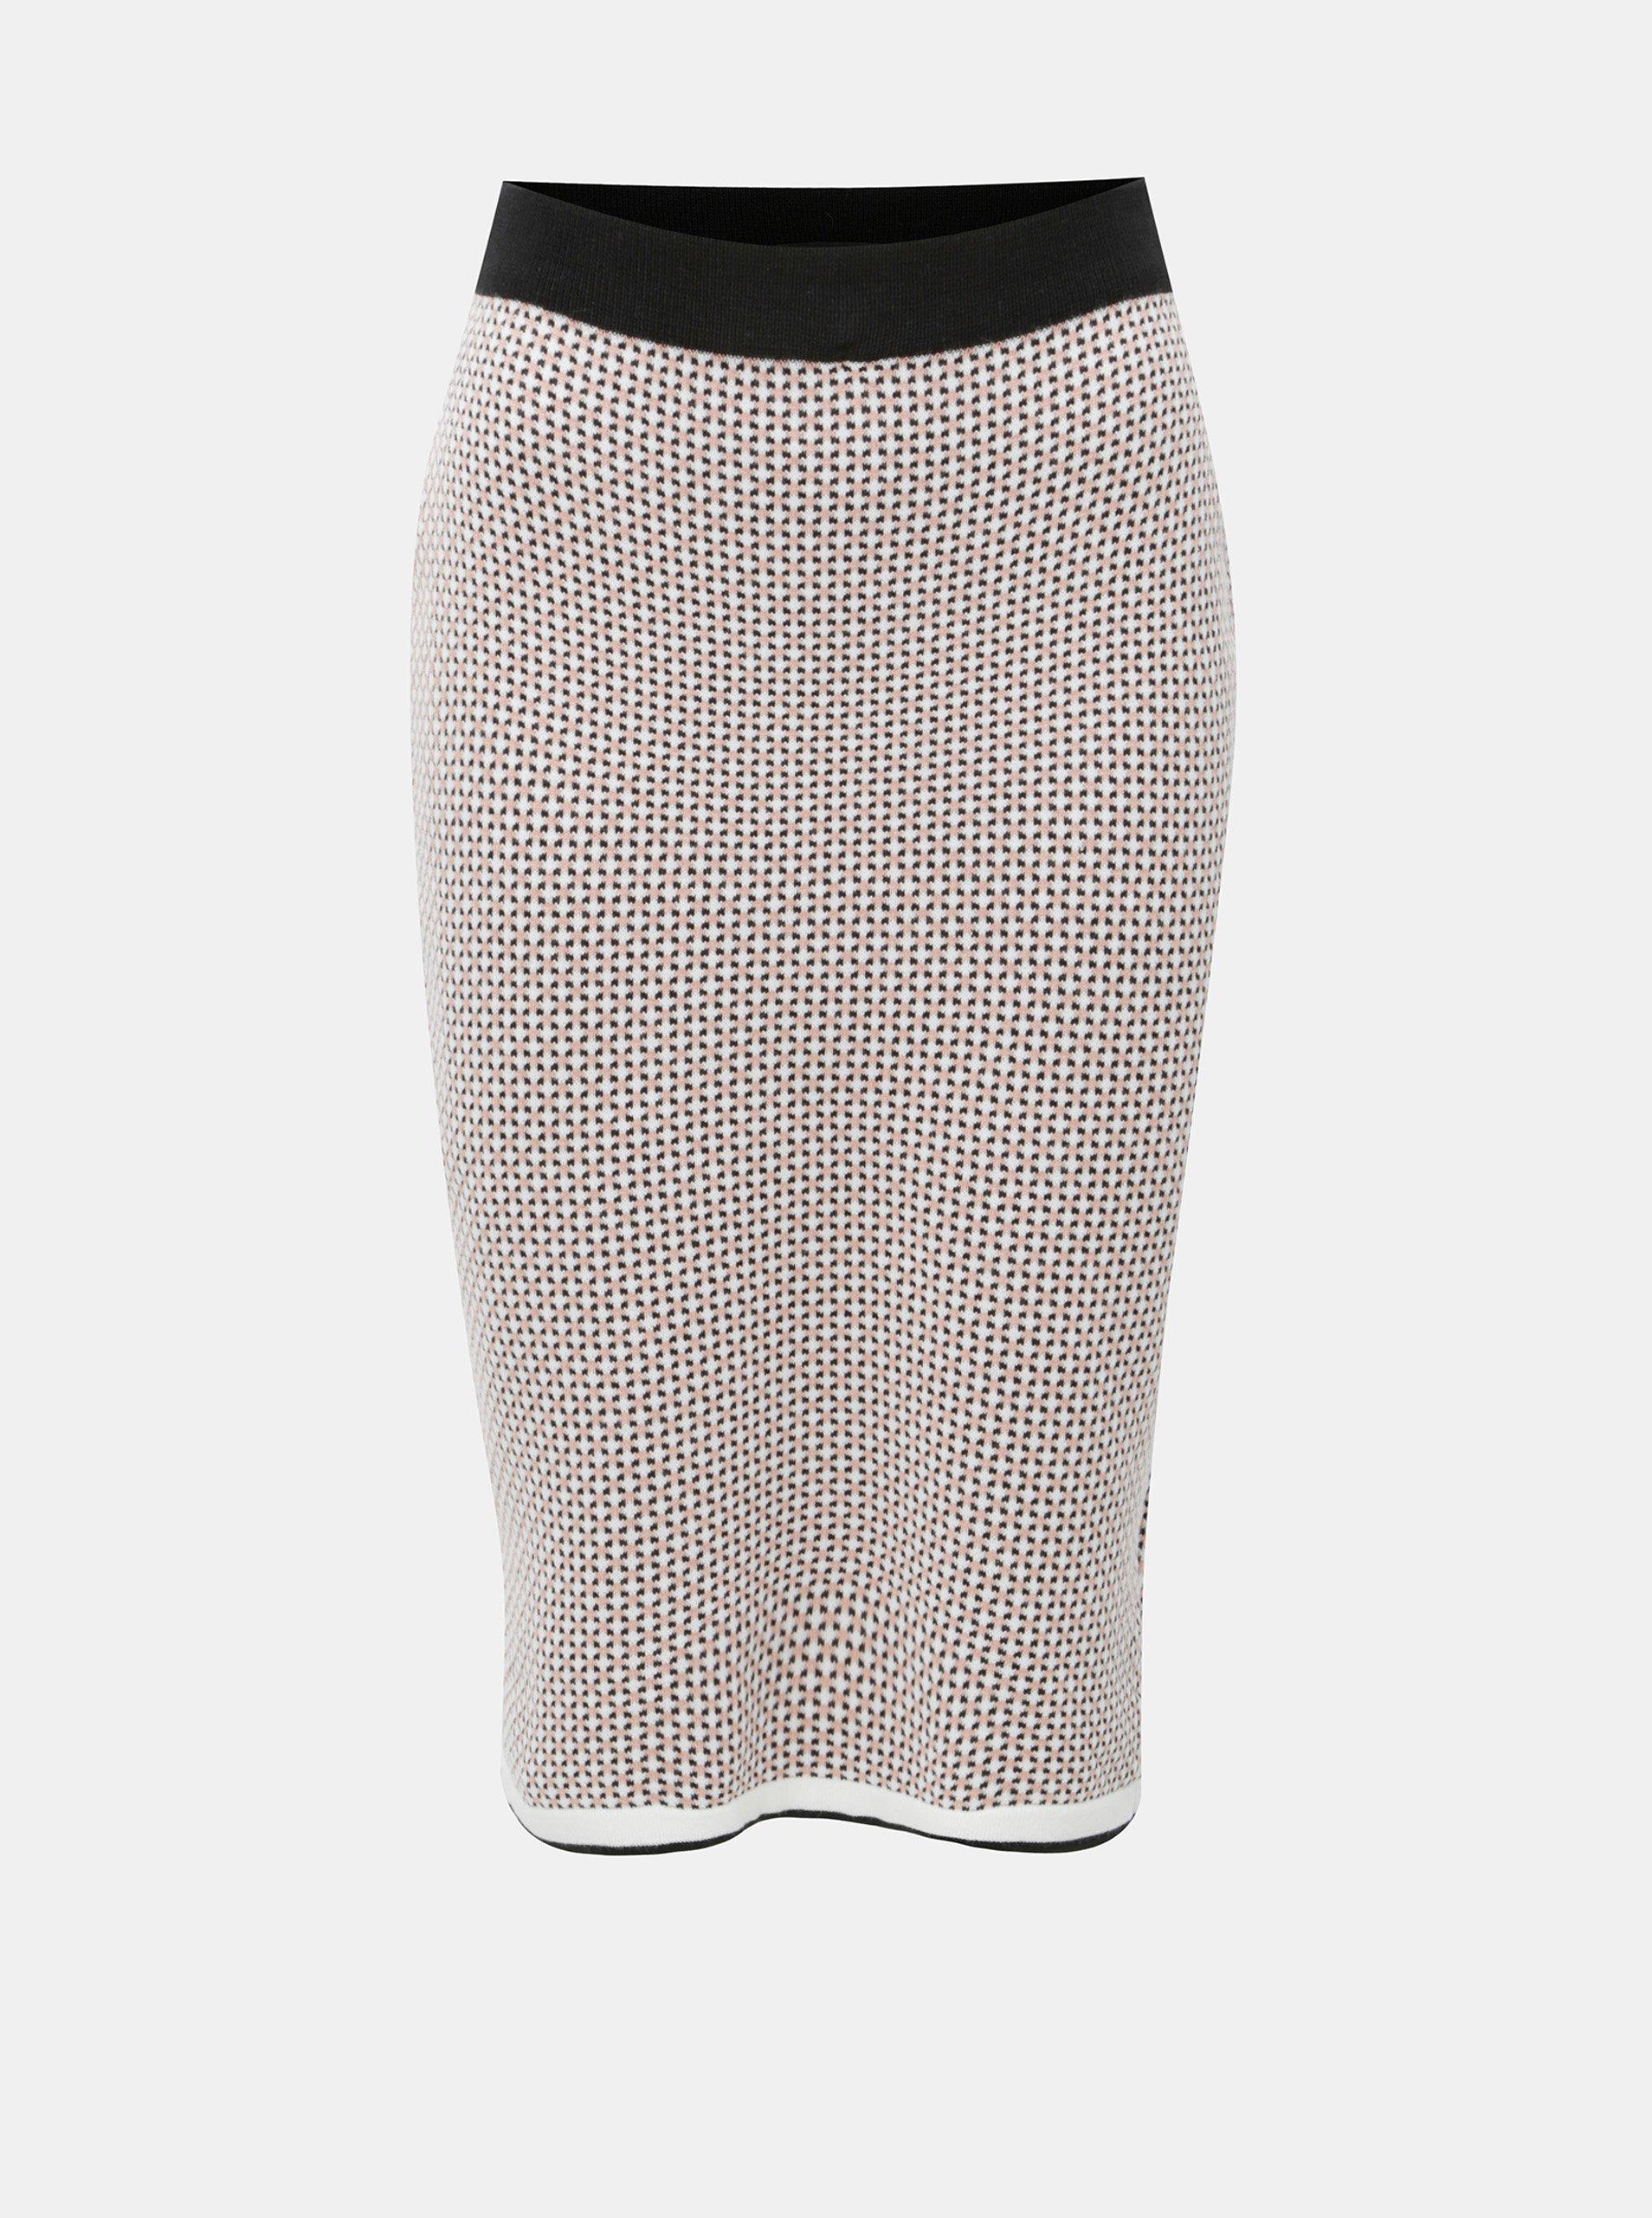 b3b6805c90d Černo-růžová pouzdrová pletená vzorovaná sukně Dorothy Perkins